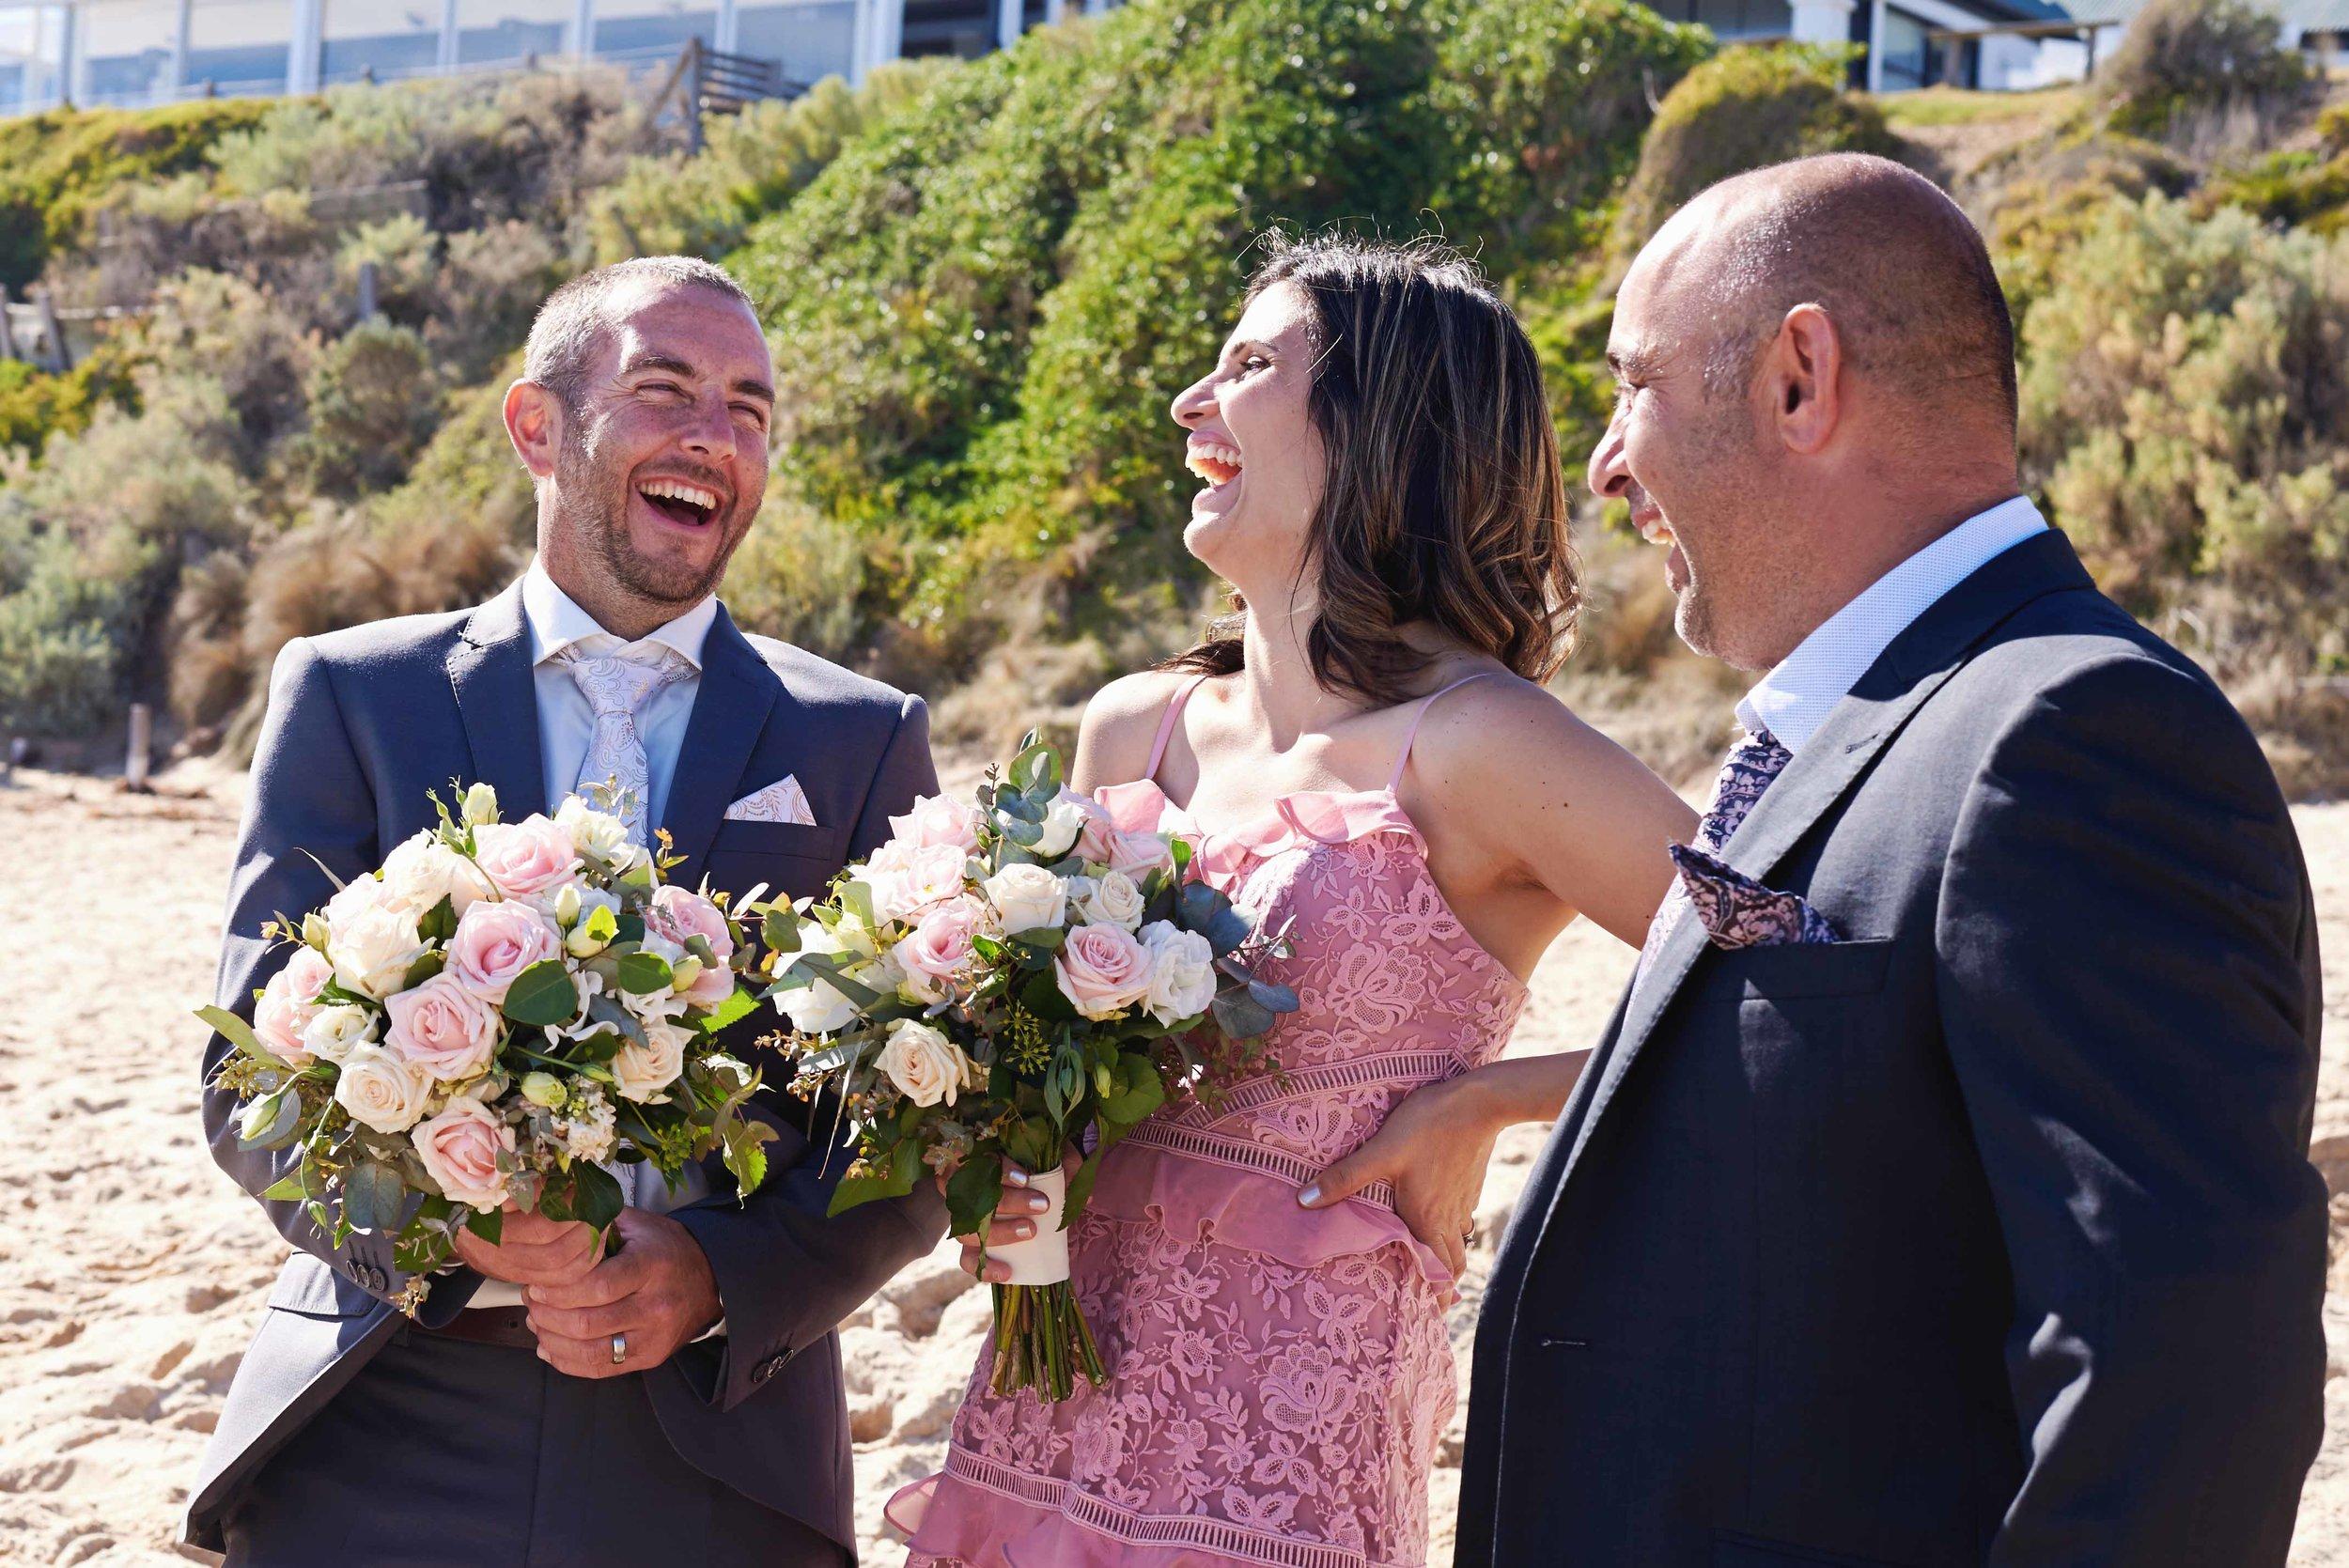 sorrento-wedding-photography-all-smiles-marissa-jade-photography-126.jpg